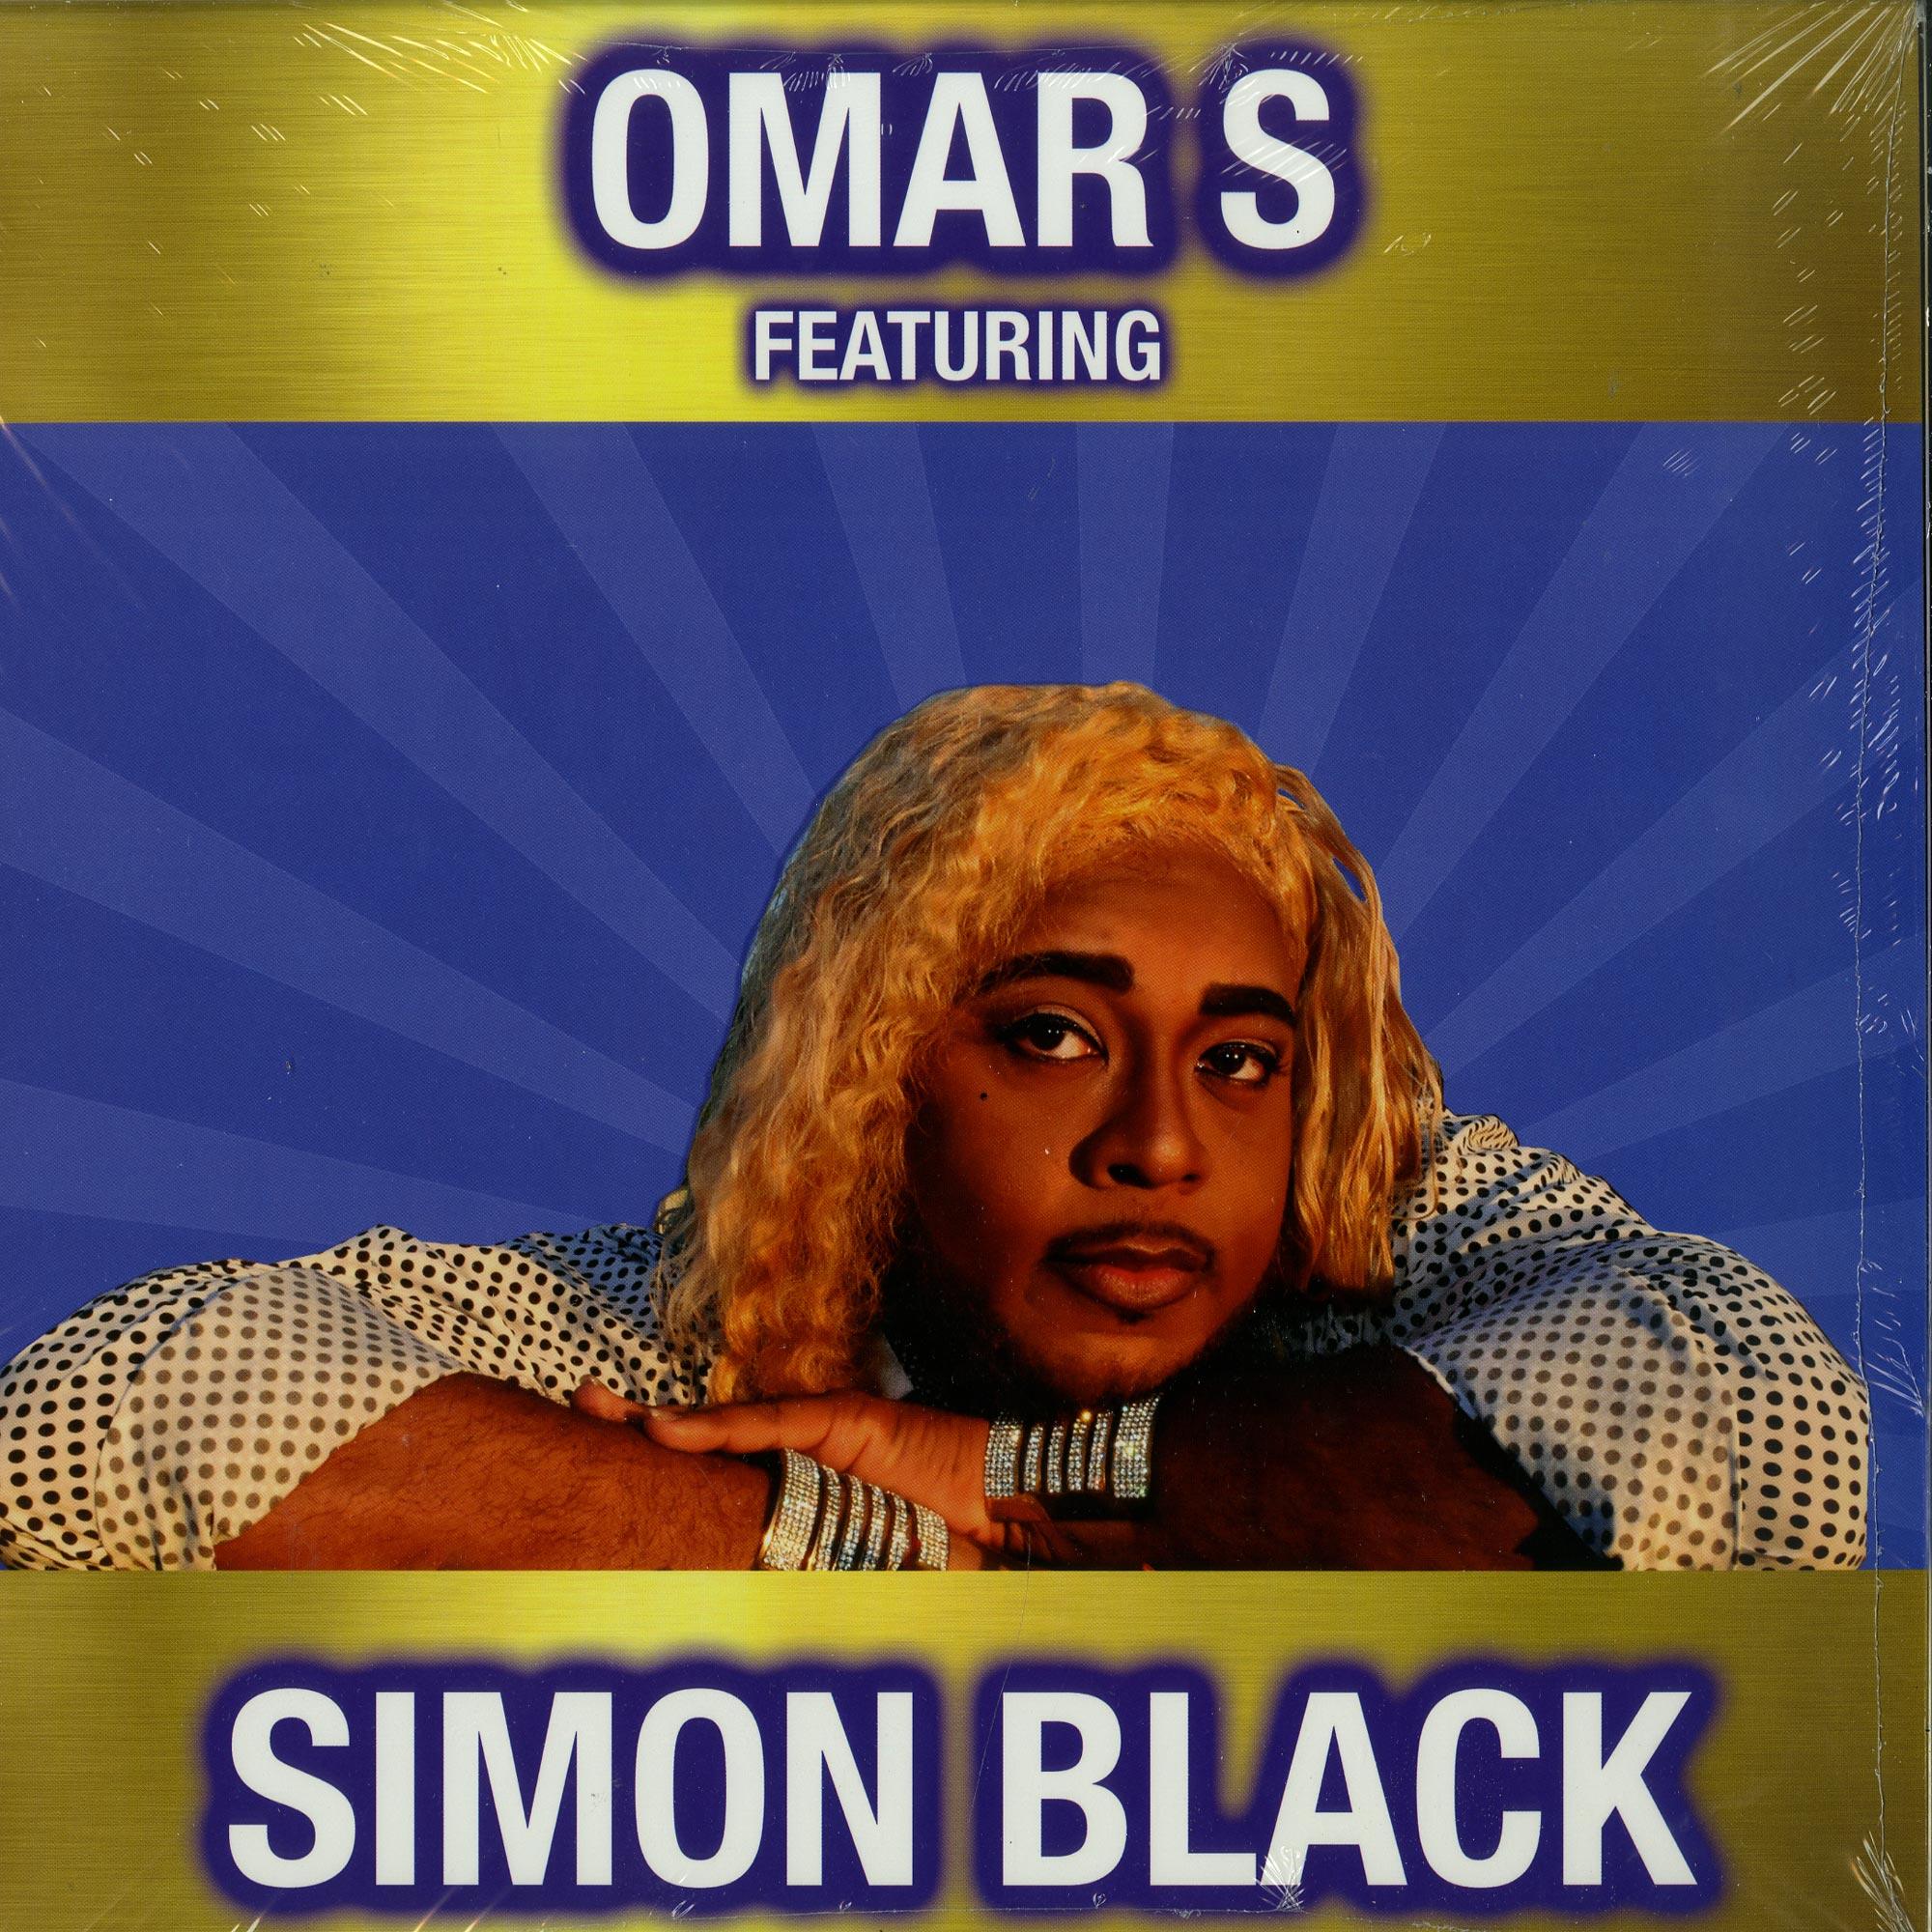 Omar-S feat. Simon Black - ILL DO IT AGAIN